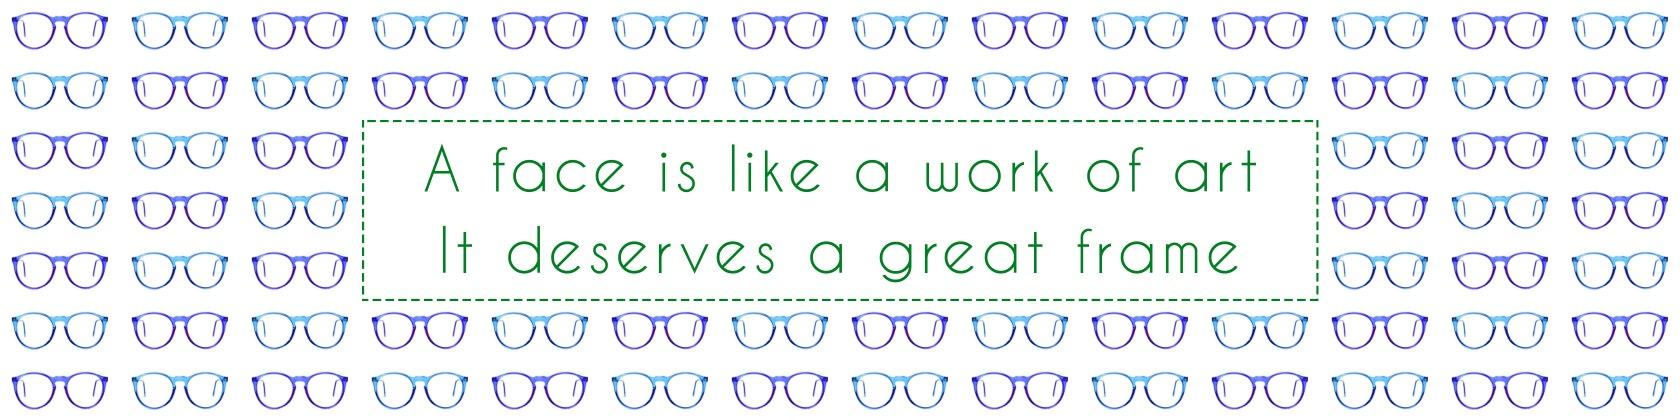 Vintage Eyeglasses & Vintage Sunglasses von MODvintageshop auf Etsy